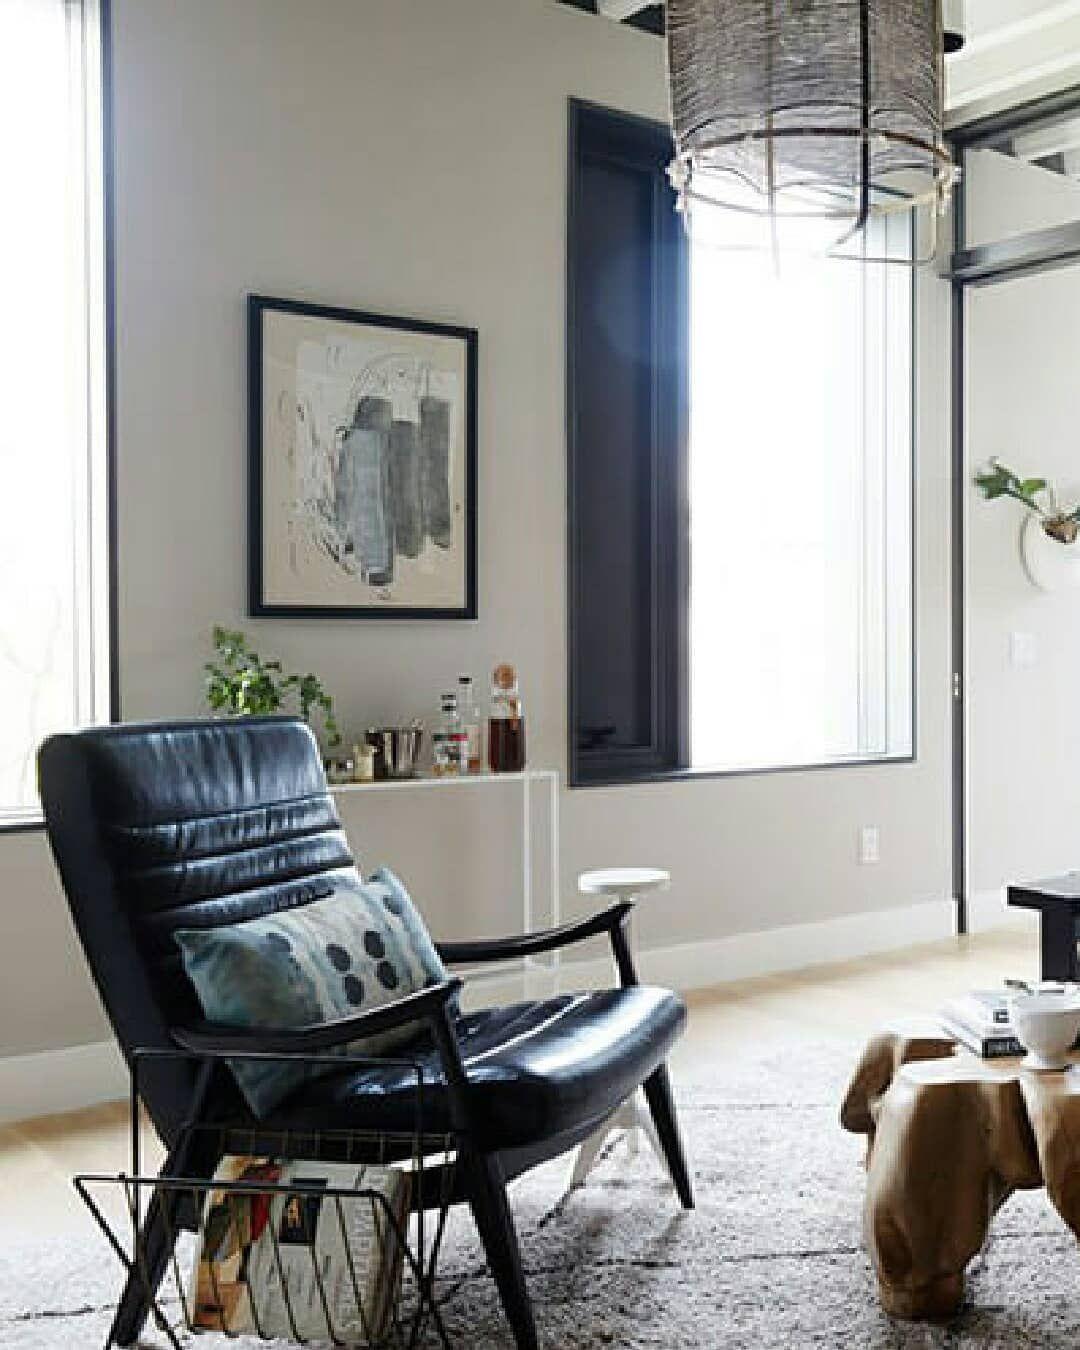 FAMILY HOME Designer Sheena Murphy's two bedroom